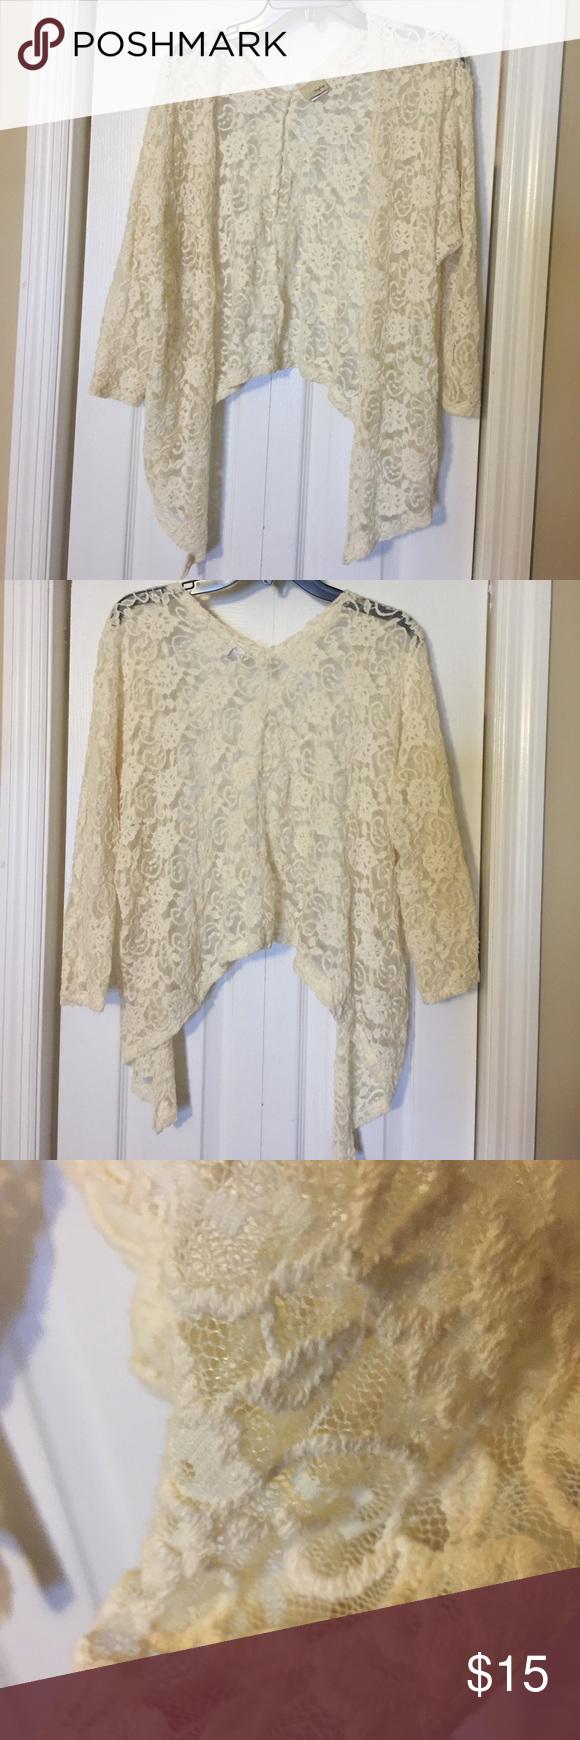 Daytrip asymmetrical lacey cardigan | White lace